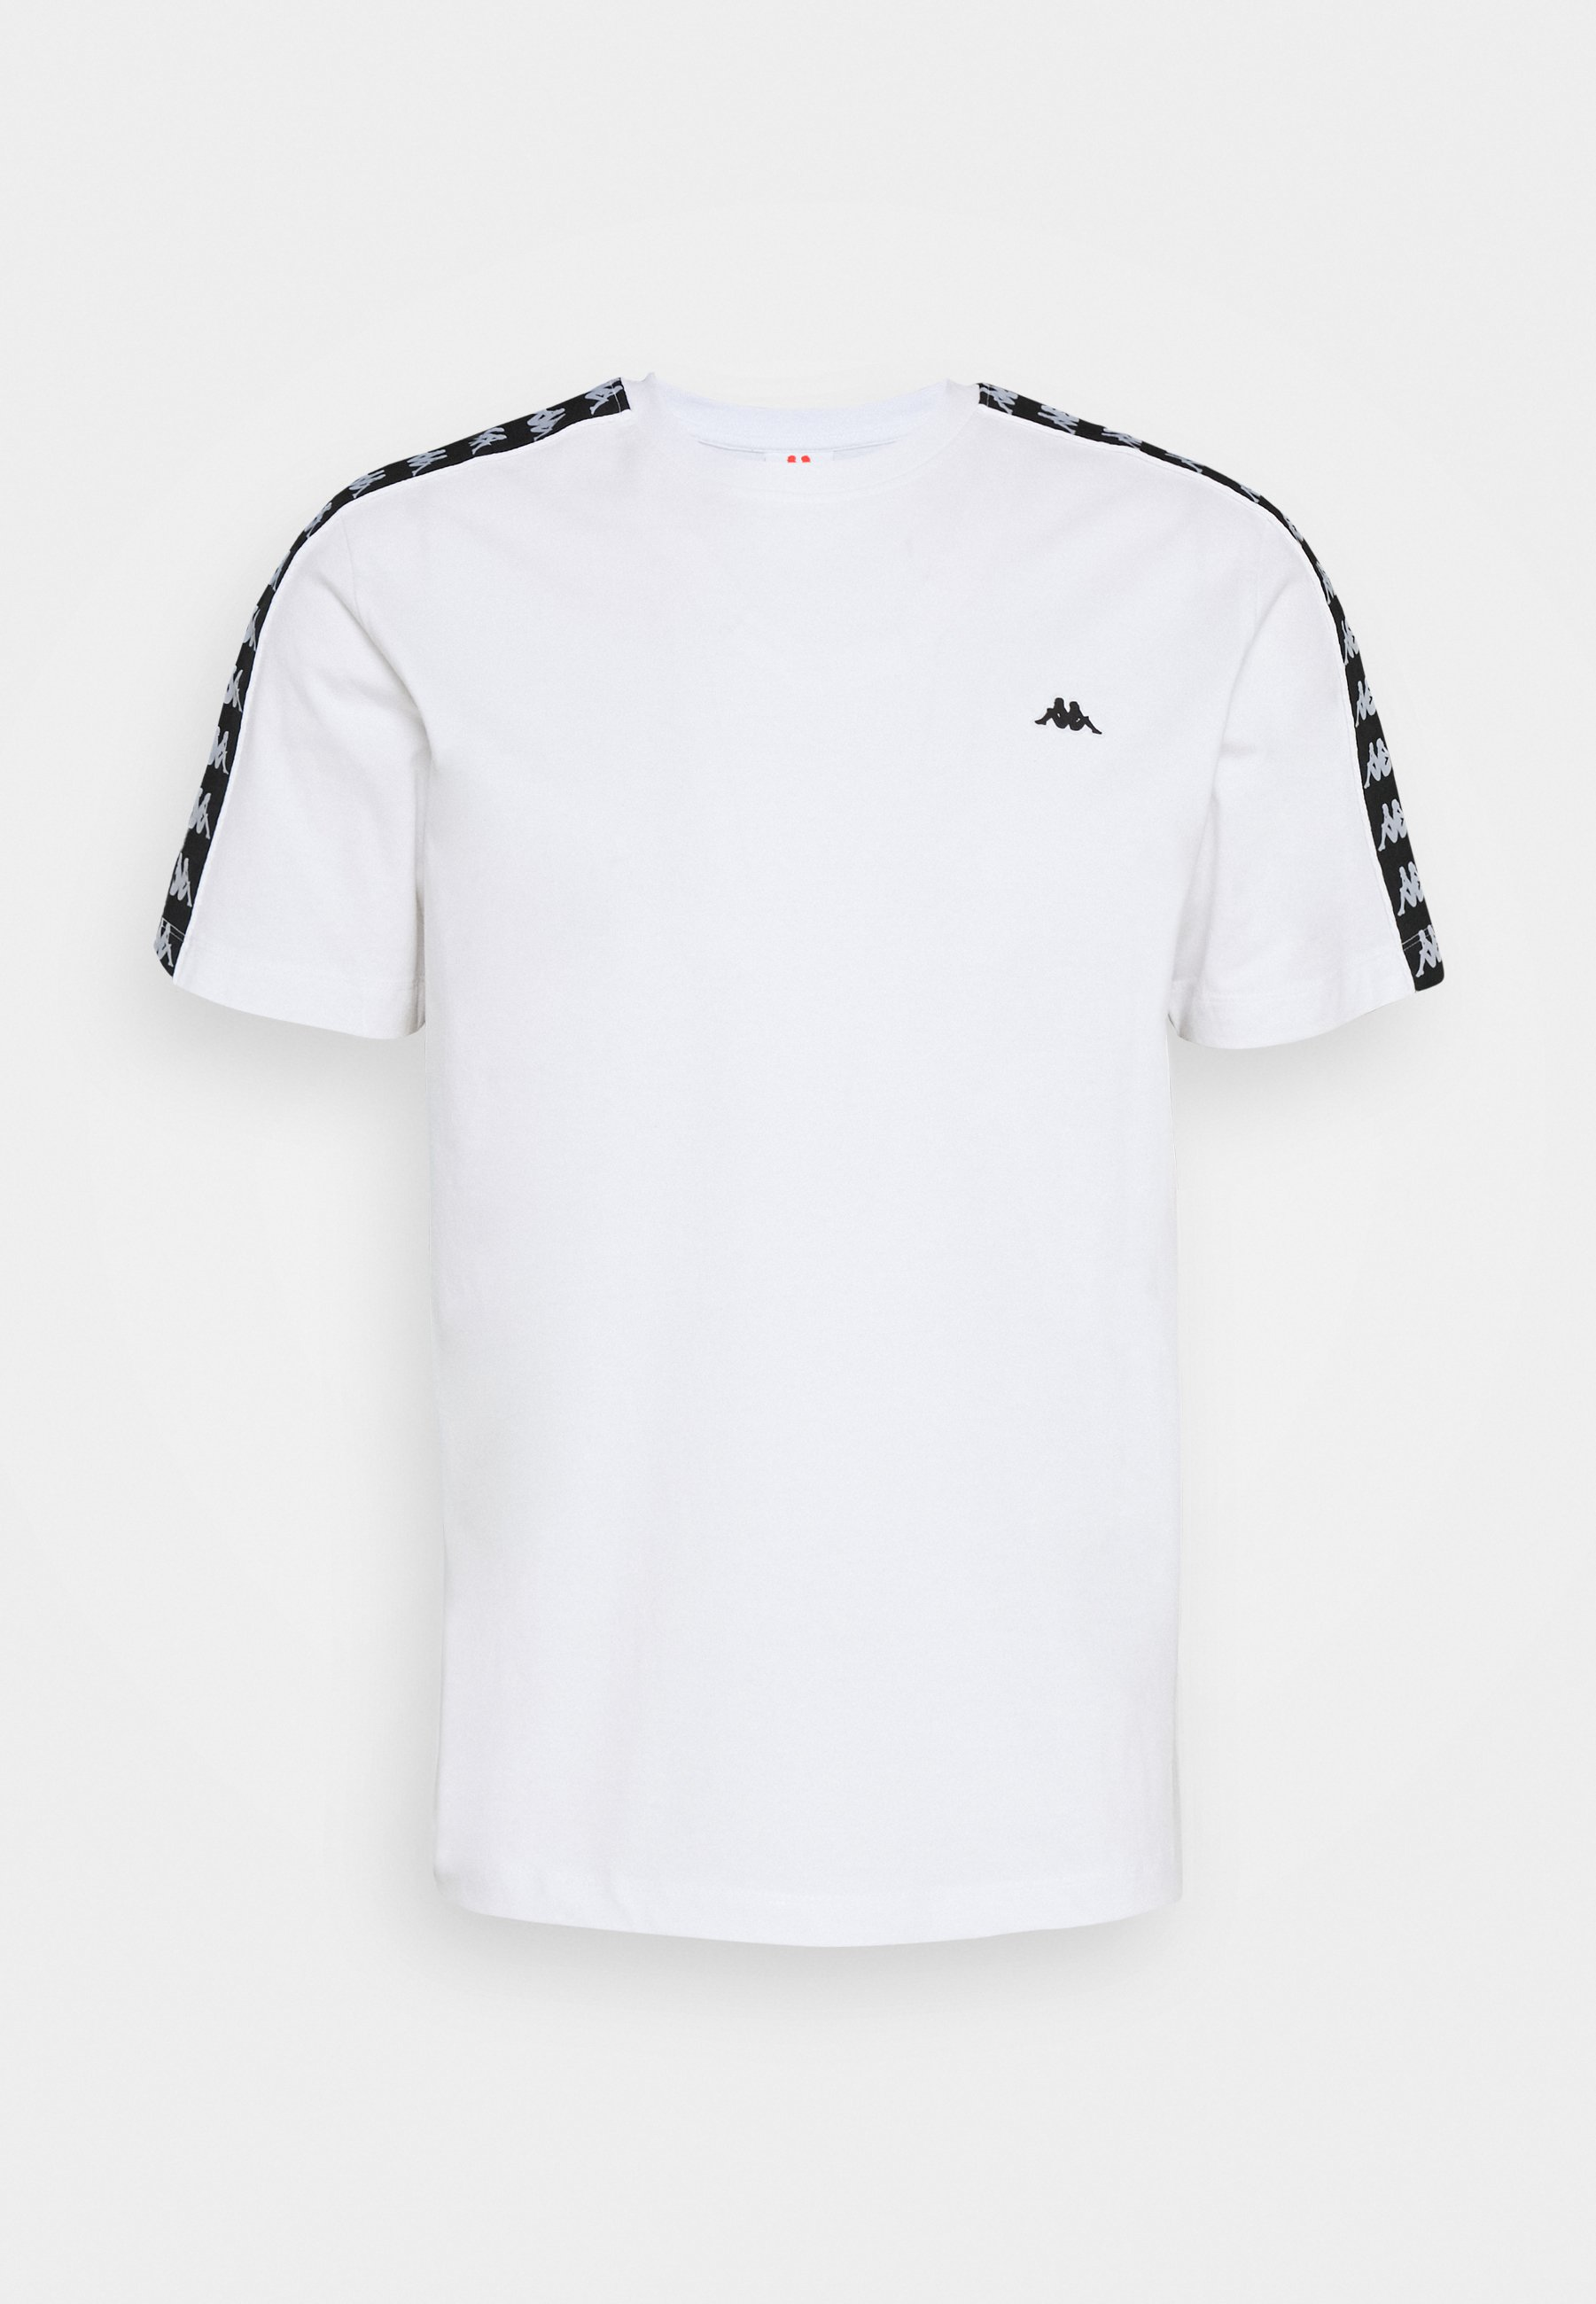 T shirts til menn | Kjøp din nye t shirts fra Kappa | kappa